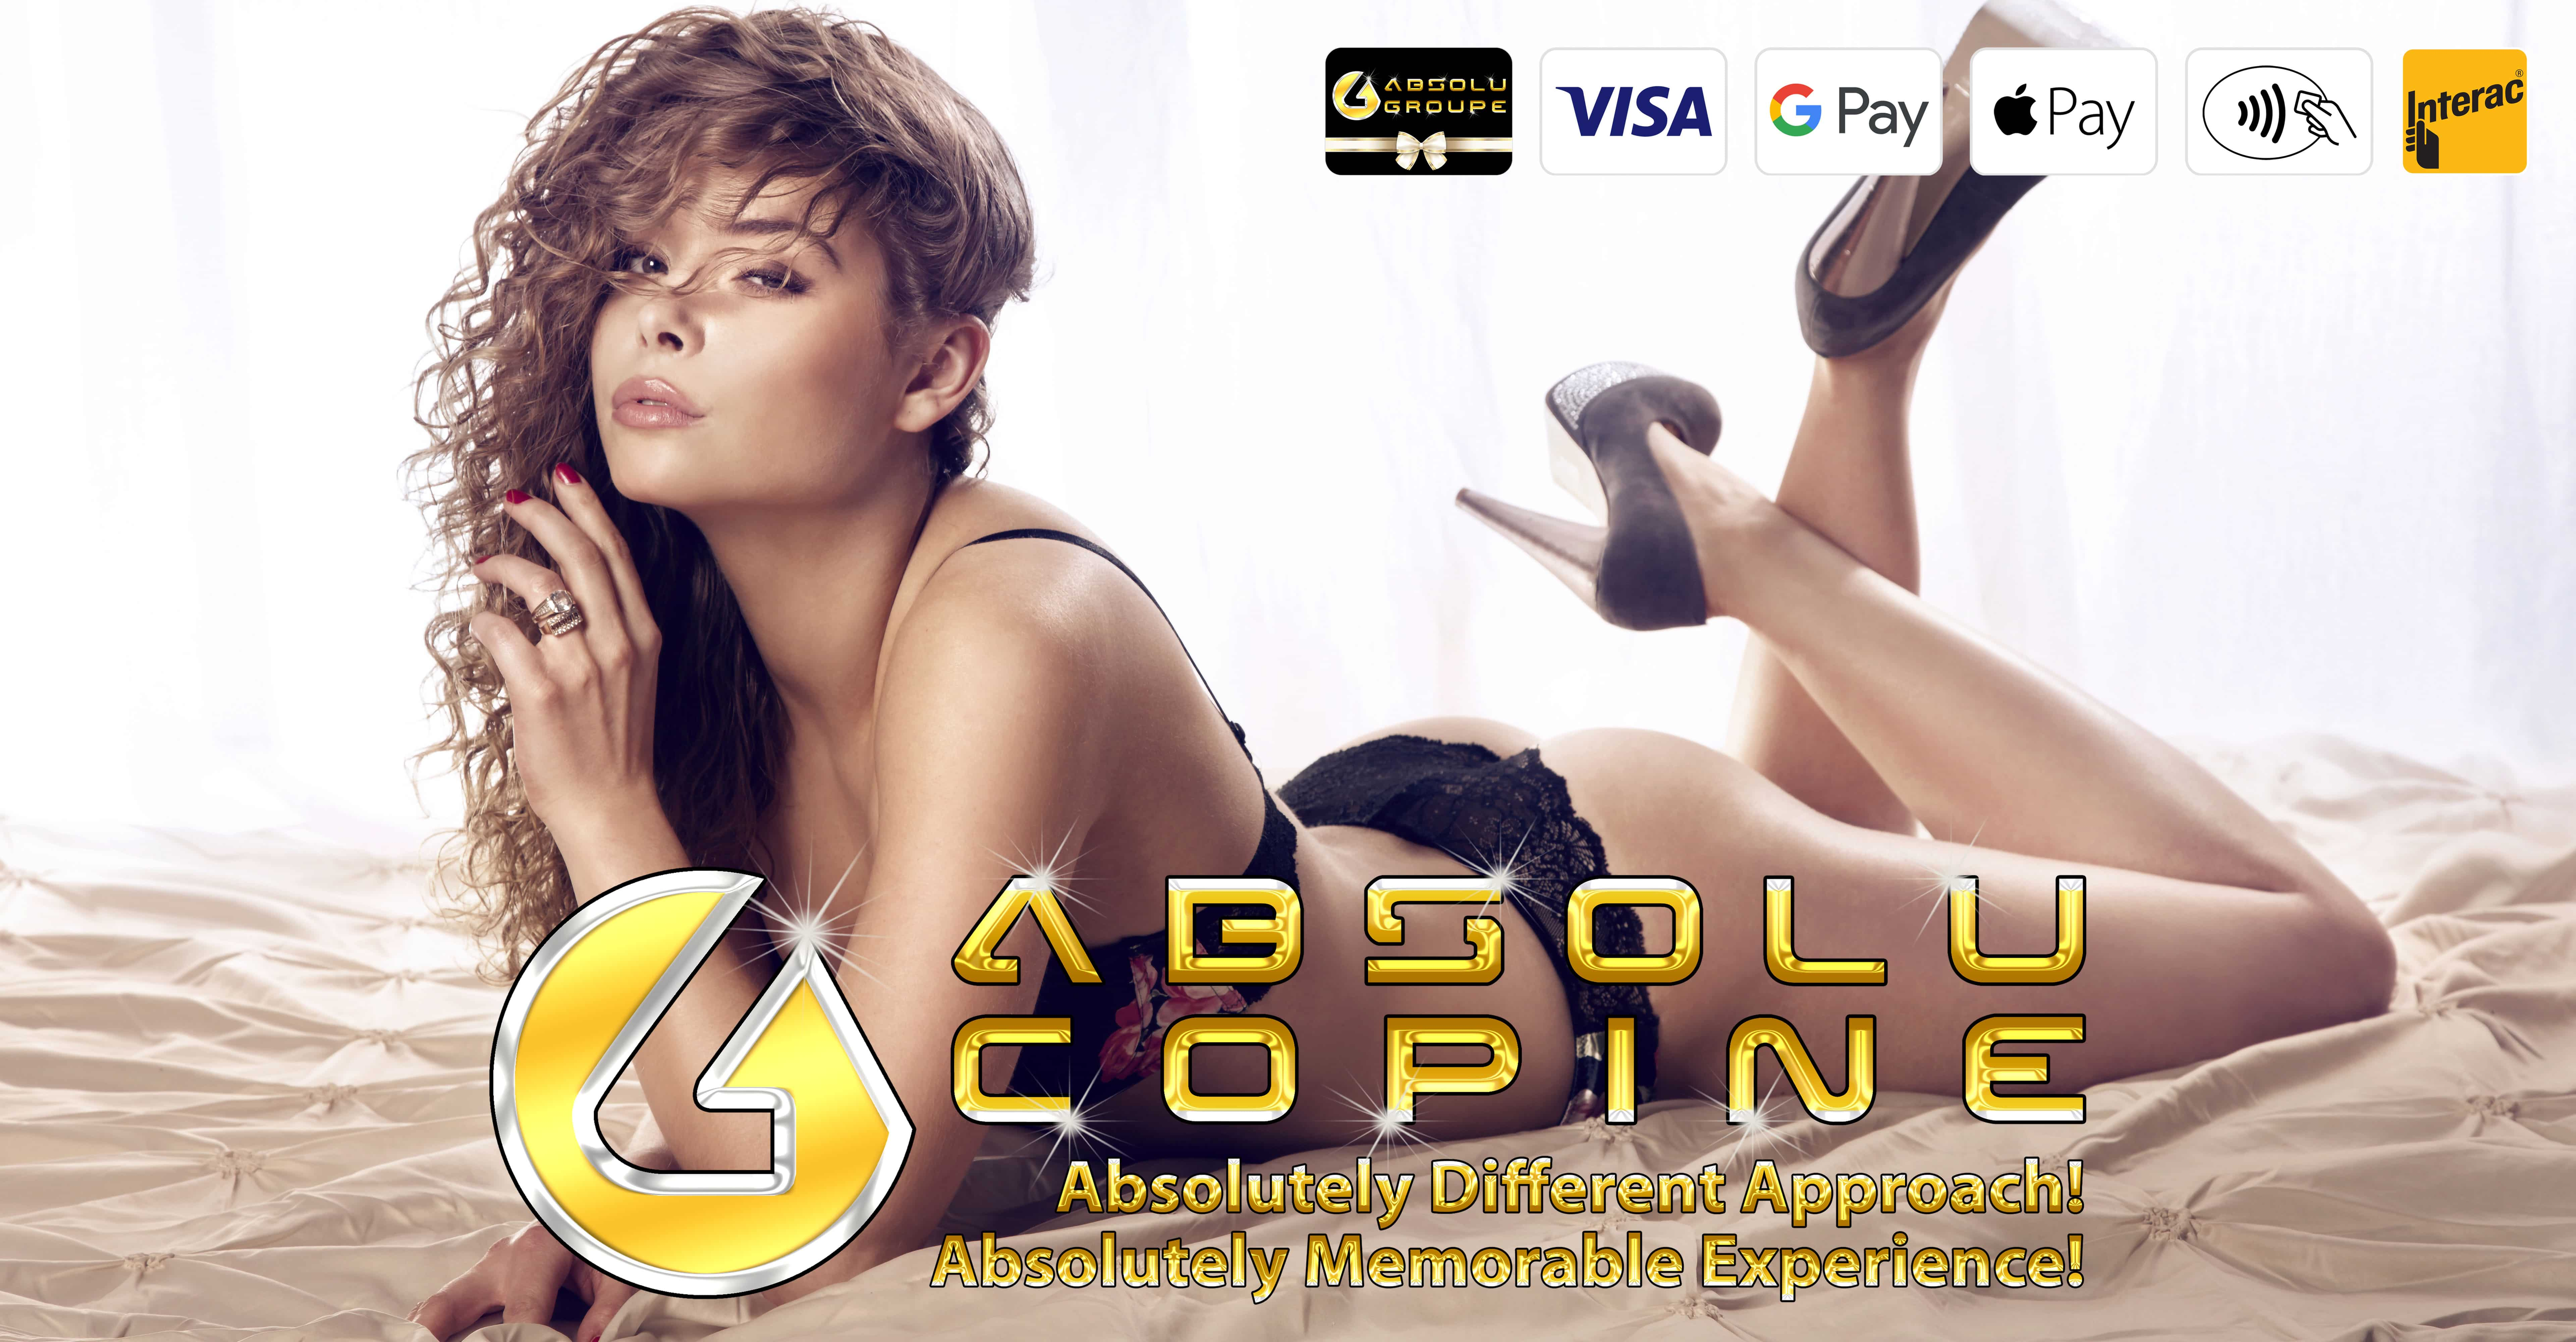 Newsletter-Subsription-Absolu-Copine-Escorts-Montreal-EN-8K